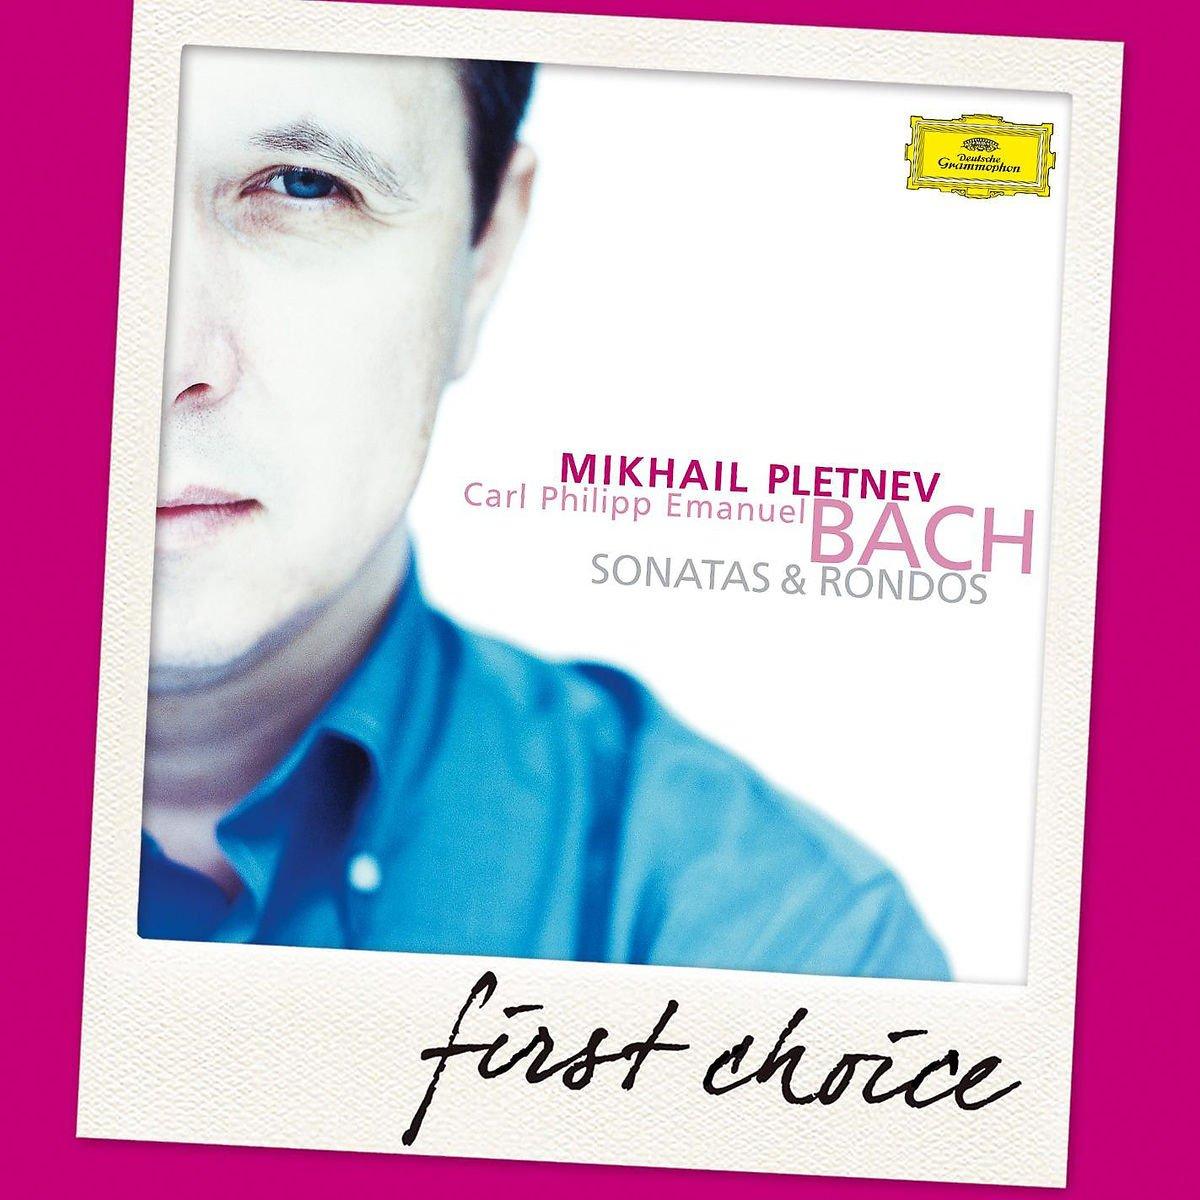 CPE Bach: Sonatas & Rondos by DEUTSCHE GRAMMOPHON,FIRST CHOICE,MUSICA BAROCCA,SOLO,MUSICA DA CAMERA,